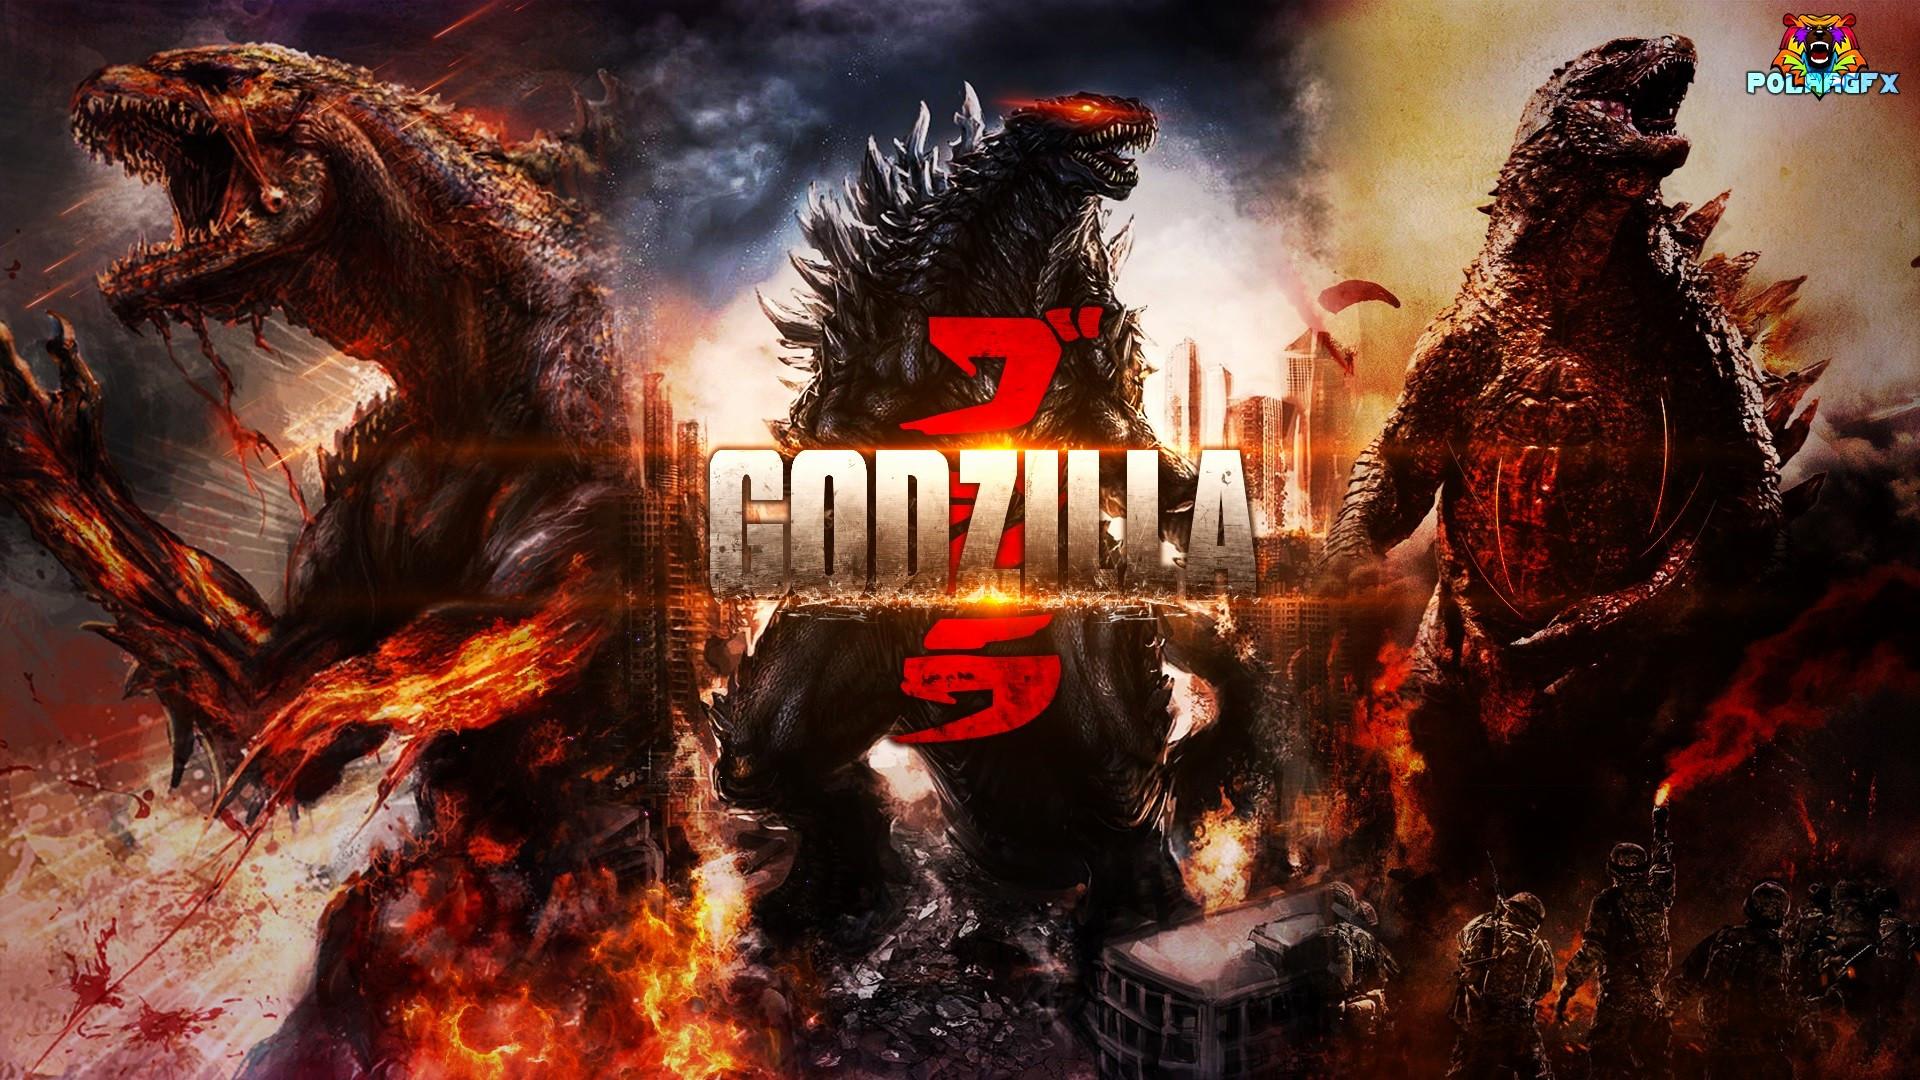 Res: 1920x1080, Godzilla Wallpaper Fresh Godzilla Wallpapers 72 Page 2 Of 3 Wallpaperdata 4k